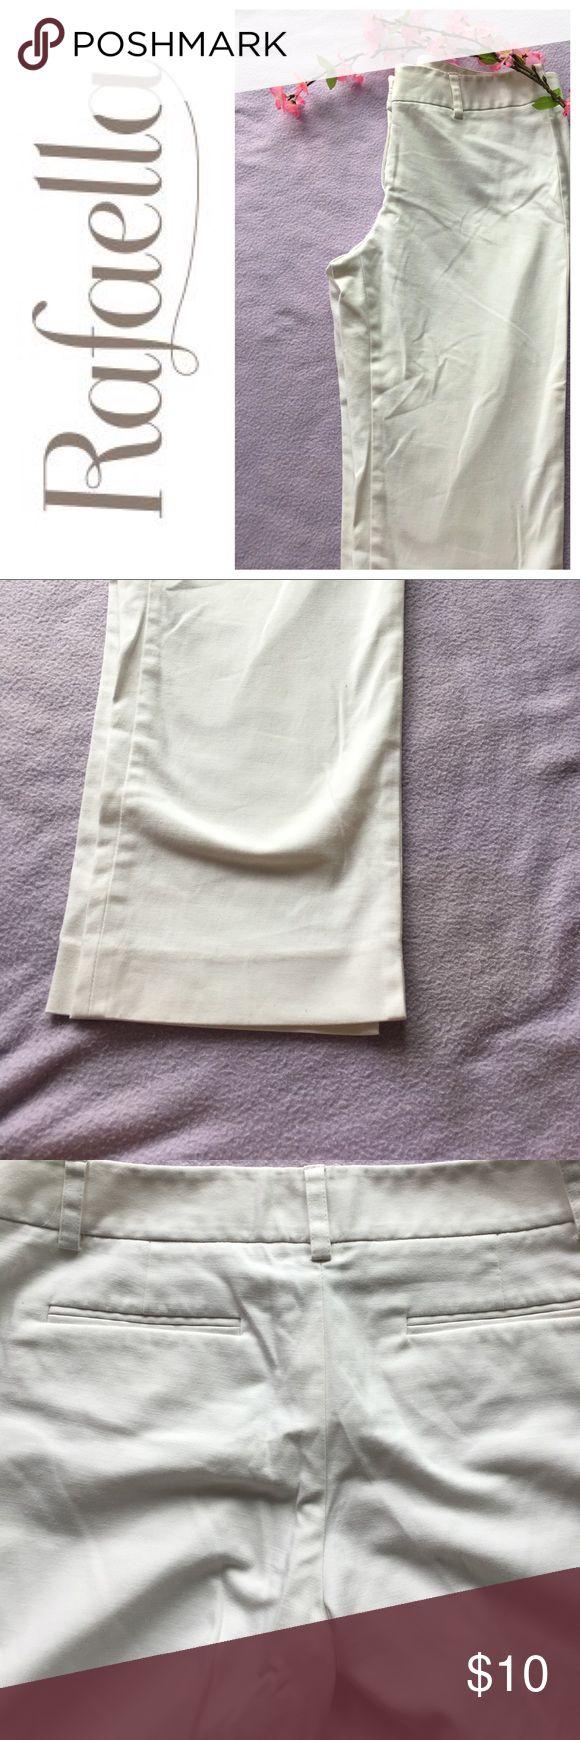 Rafaella white Capris Rafaella white dress pant type capris size 10 good condition Rafaella Pants Capris